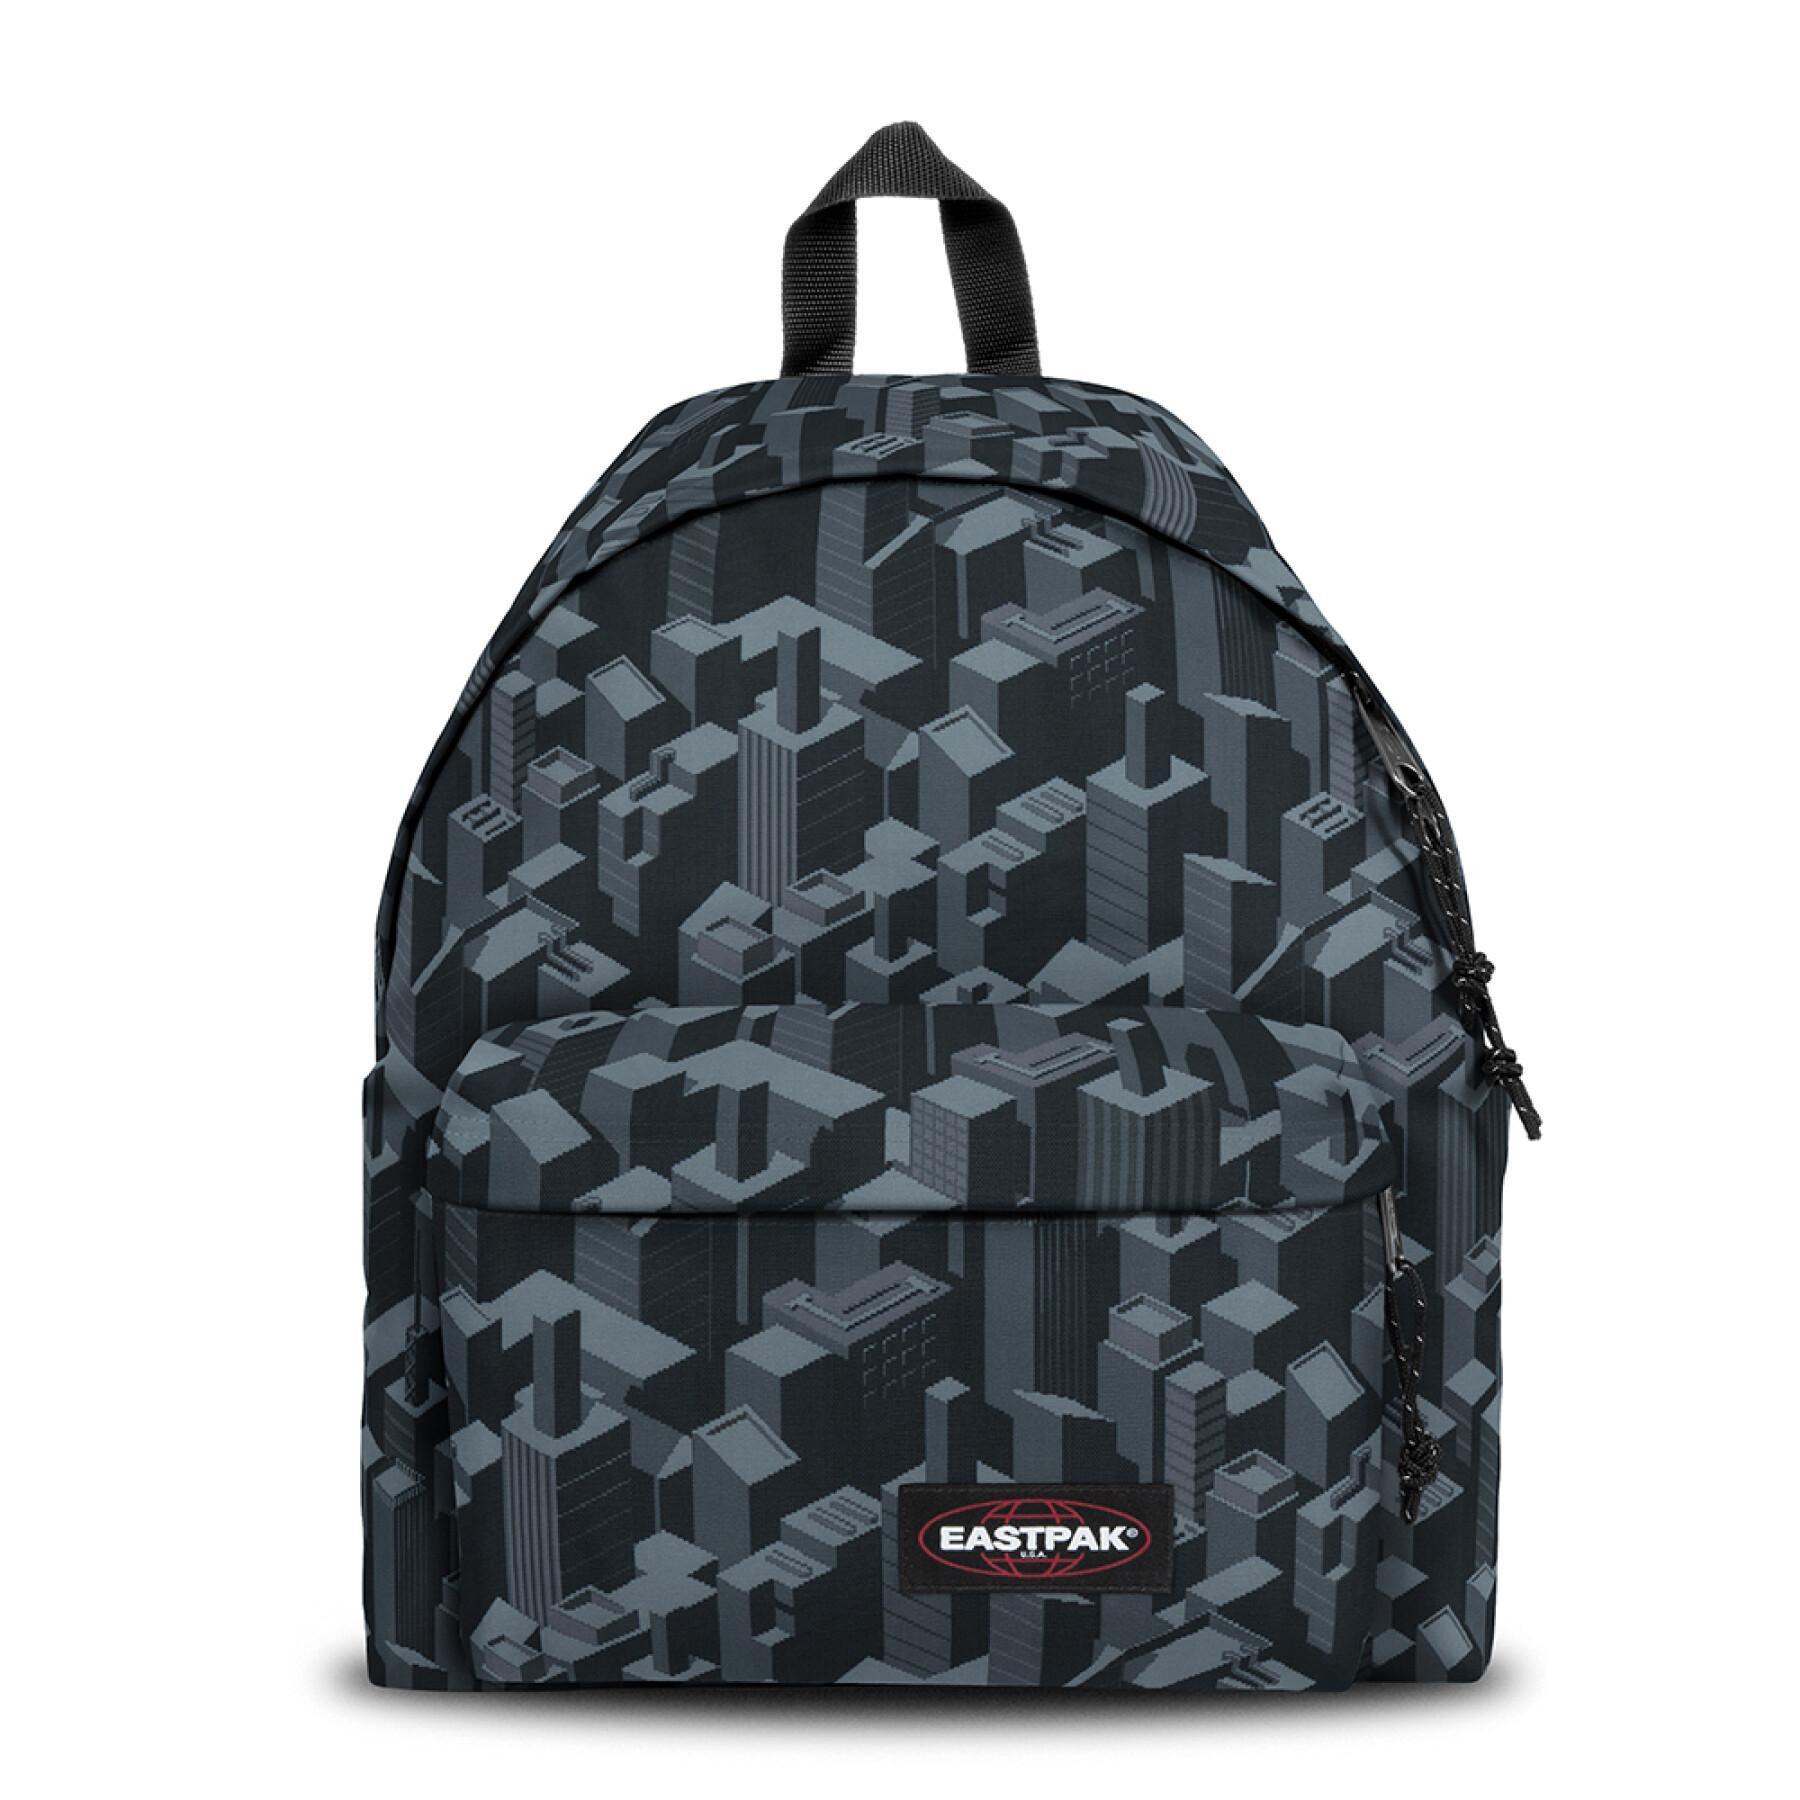 Backpack Eastpak Padded Pak'r Pixel Black